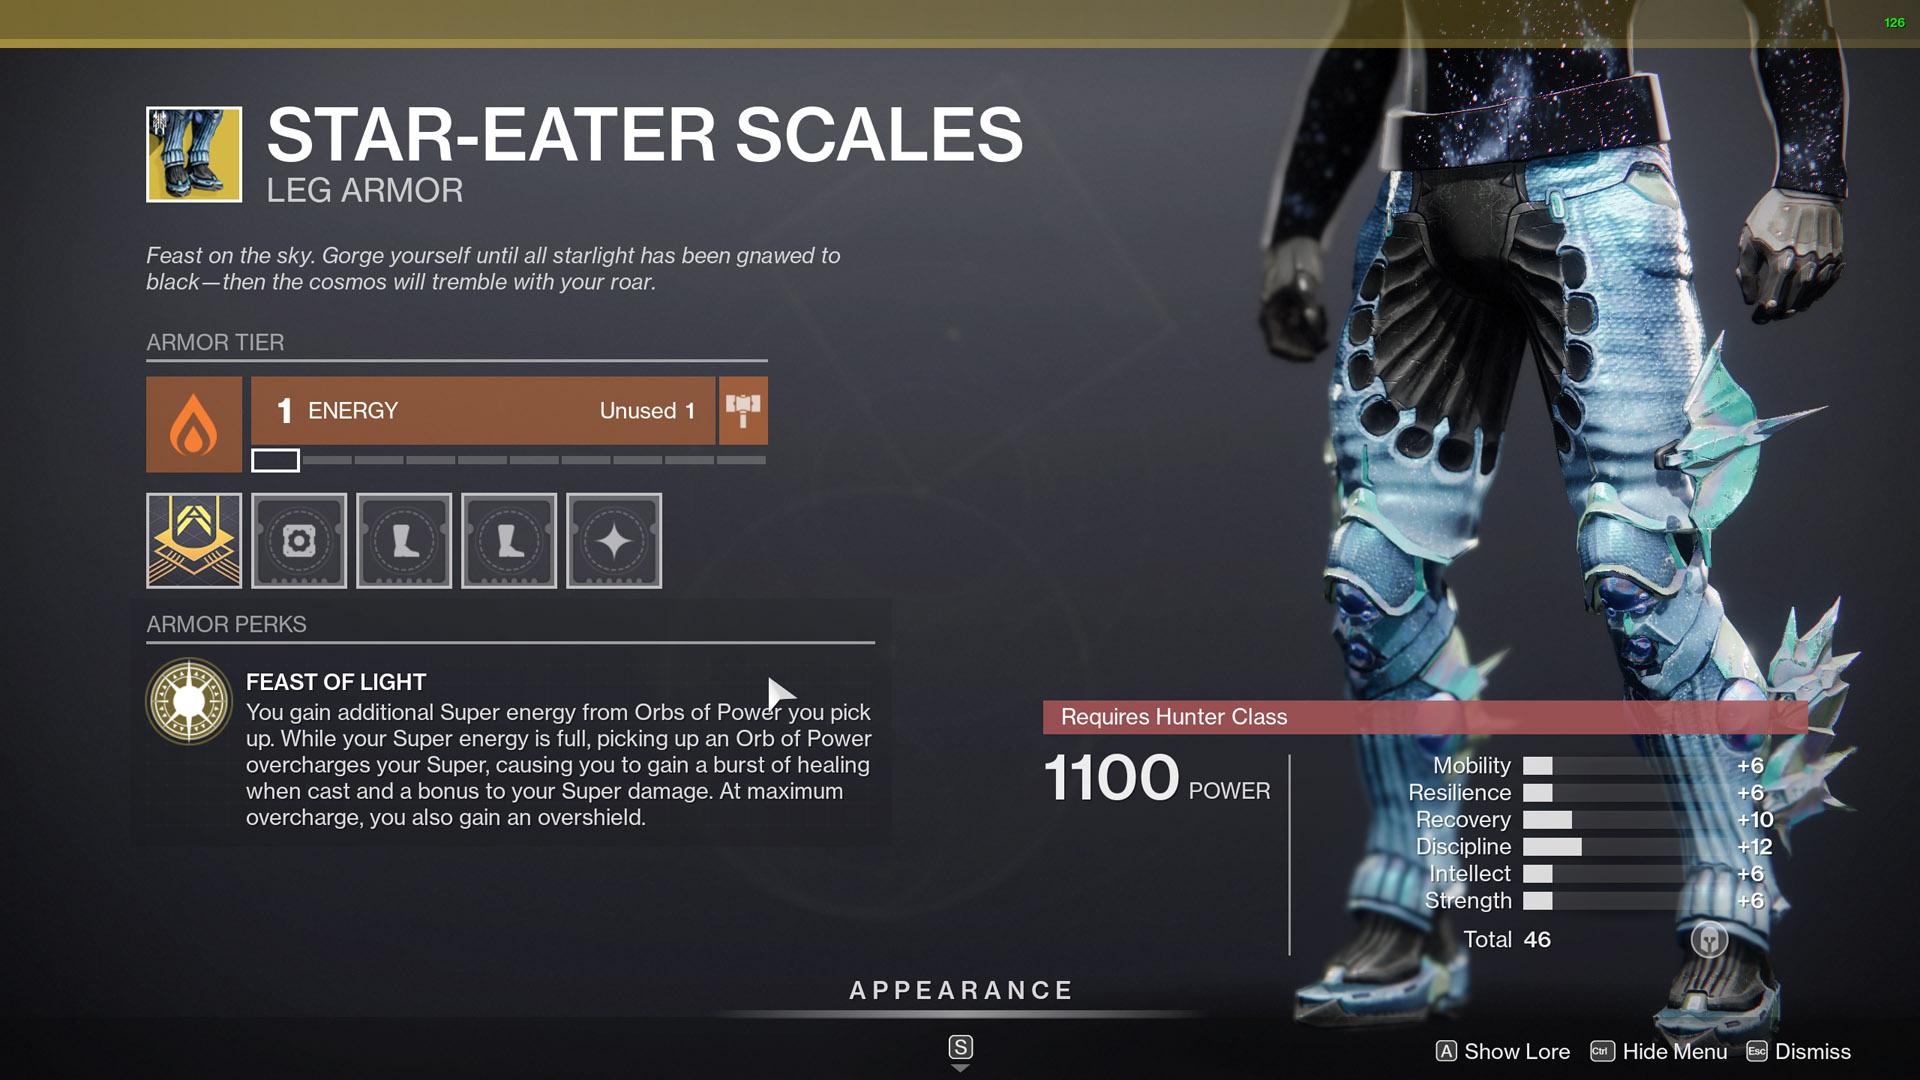 destiny 2 star-eater scales perk feast of light